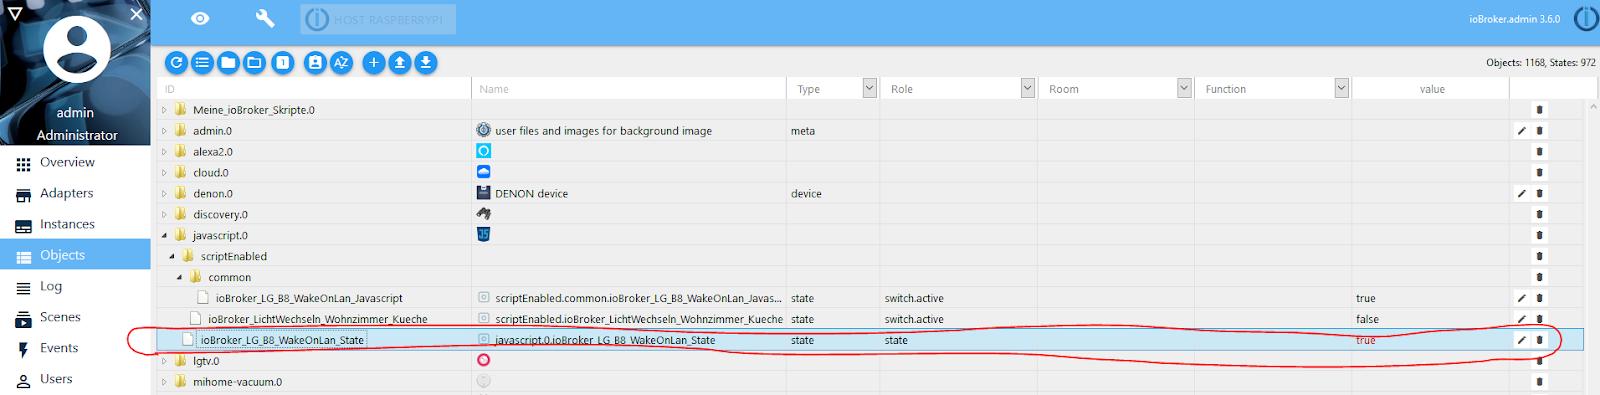 ioBroker%2BWake-on-LAN%2BTutorial%2BScreenshots%2B%25282%2529.png